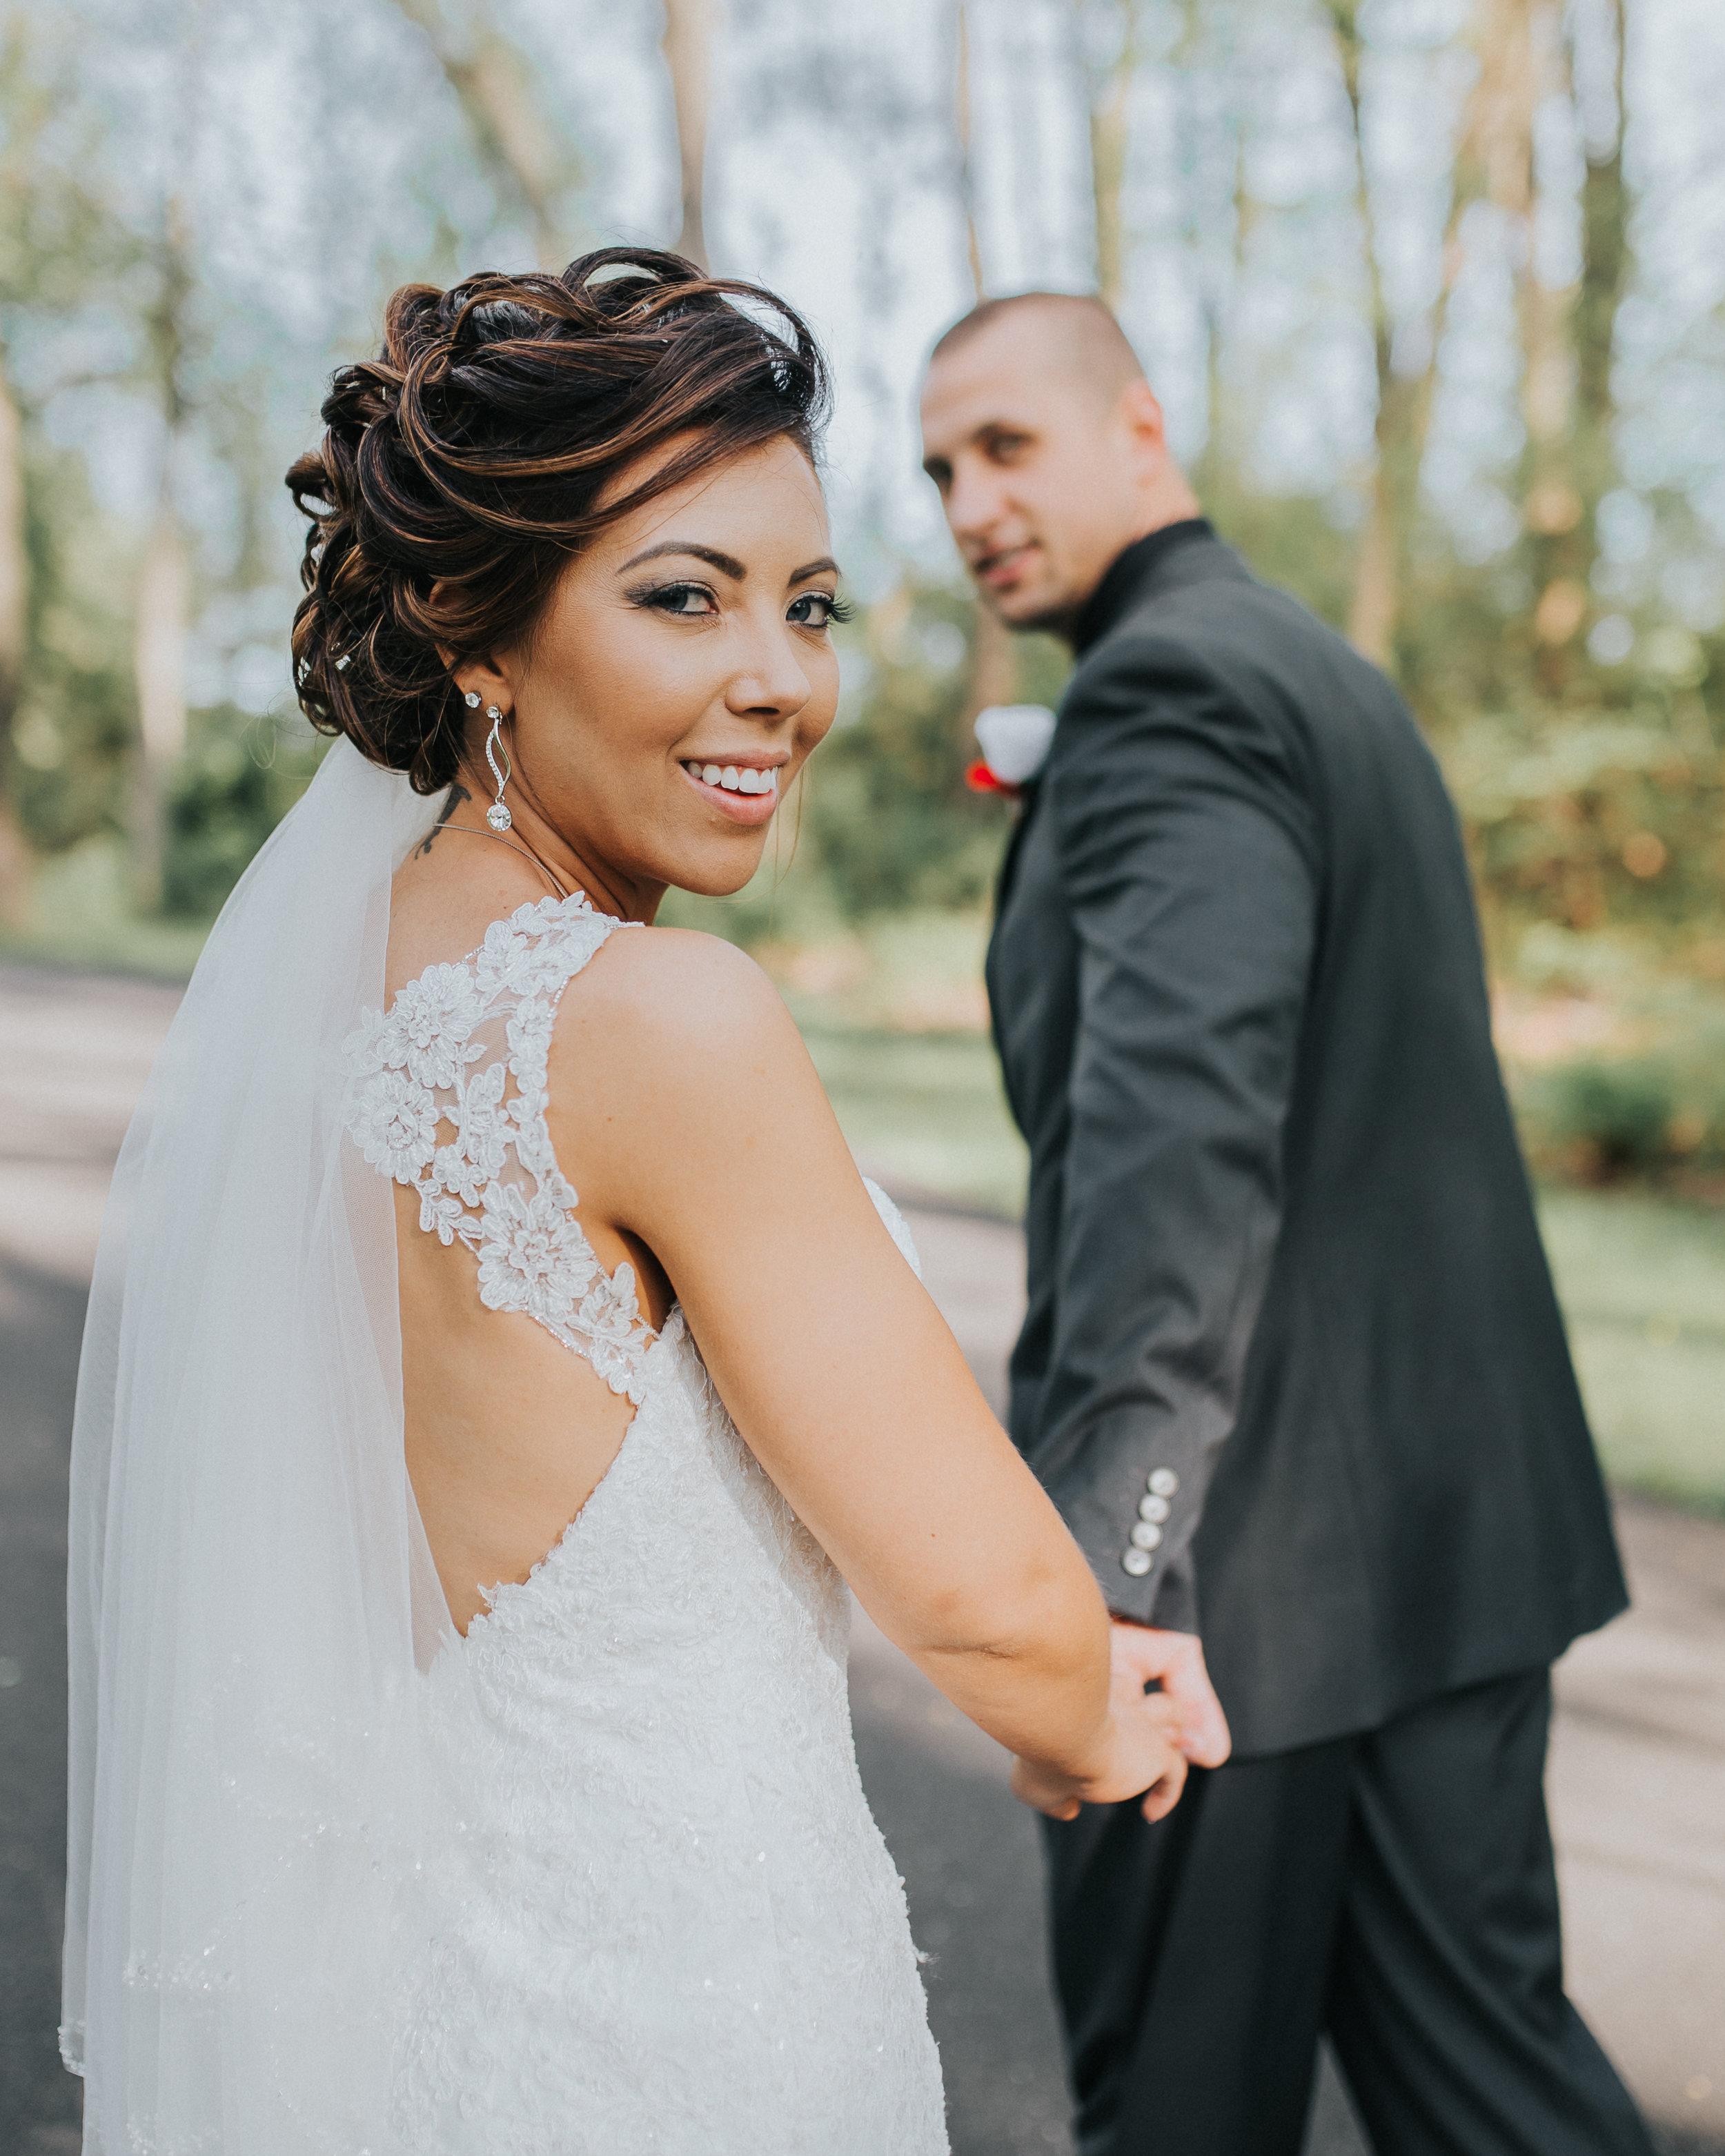 Christina-and-Gene-Wedding-Marla-Rain-Photography-276.jpg